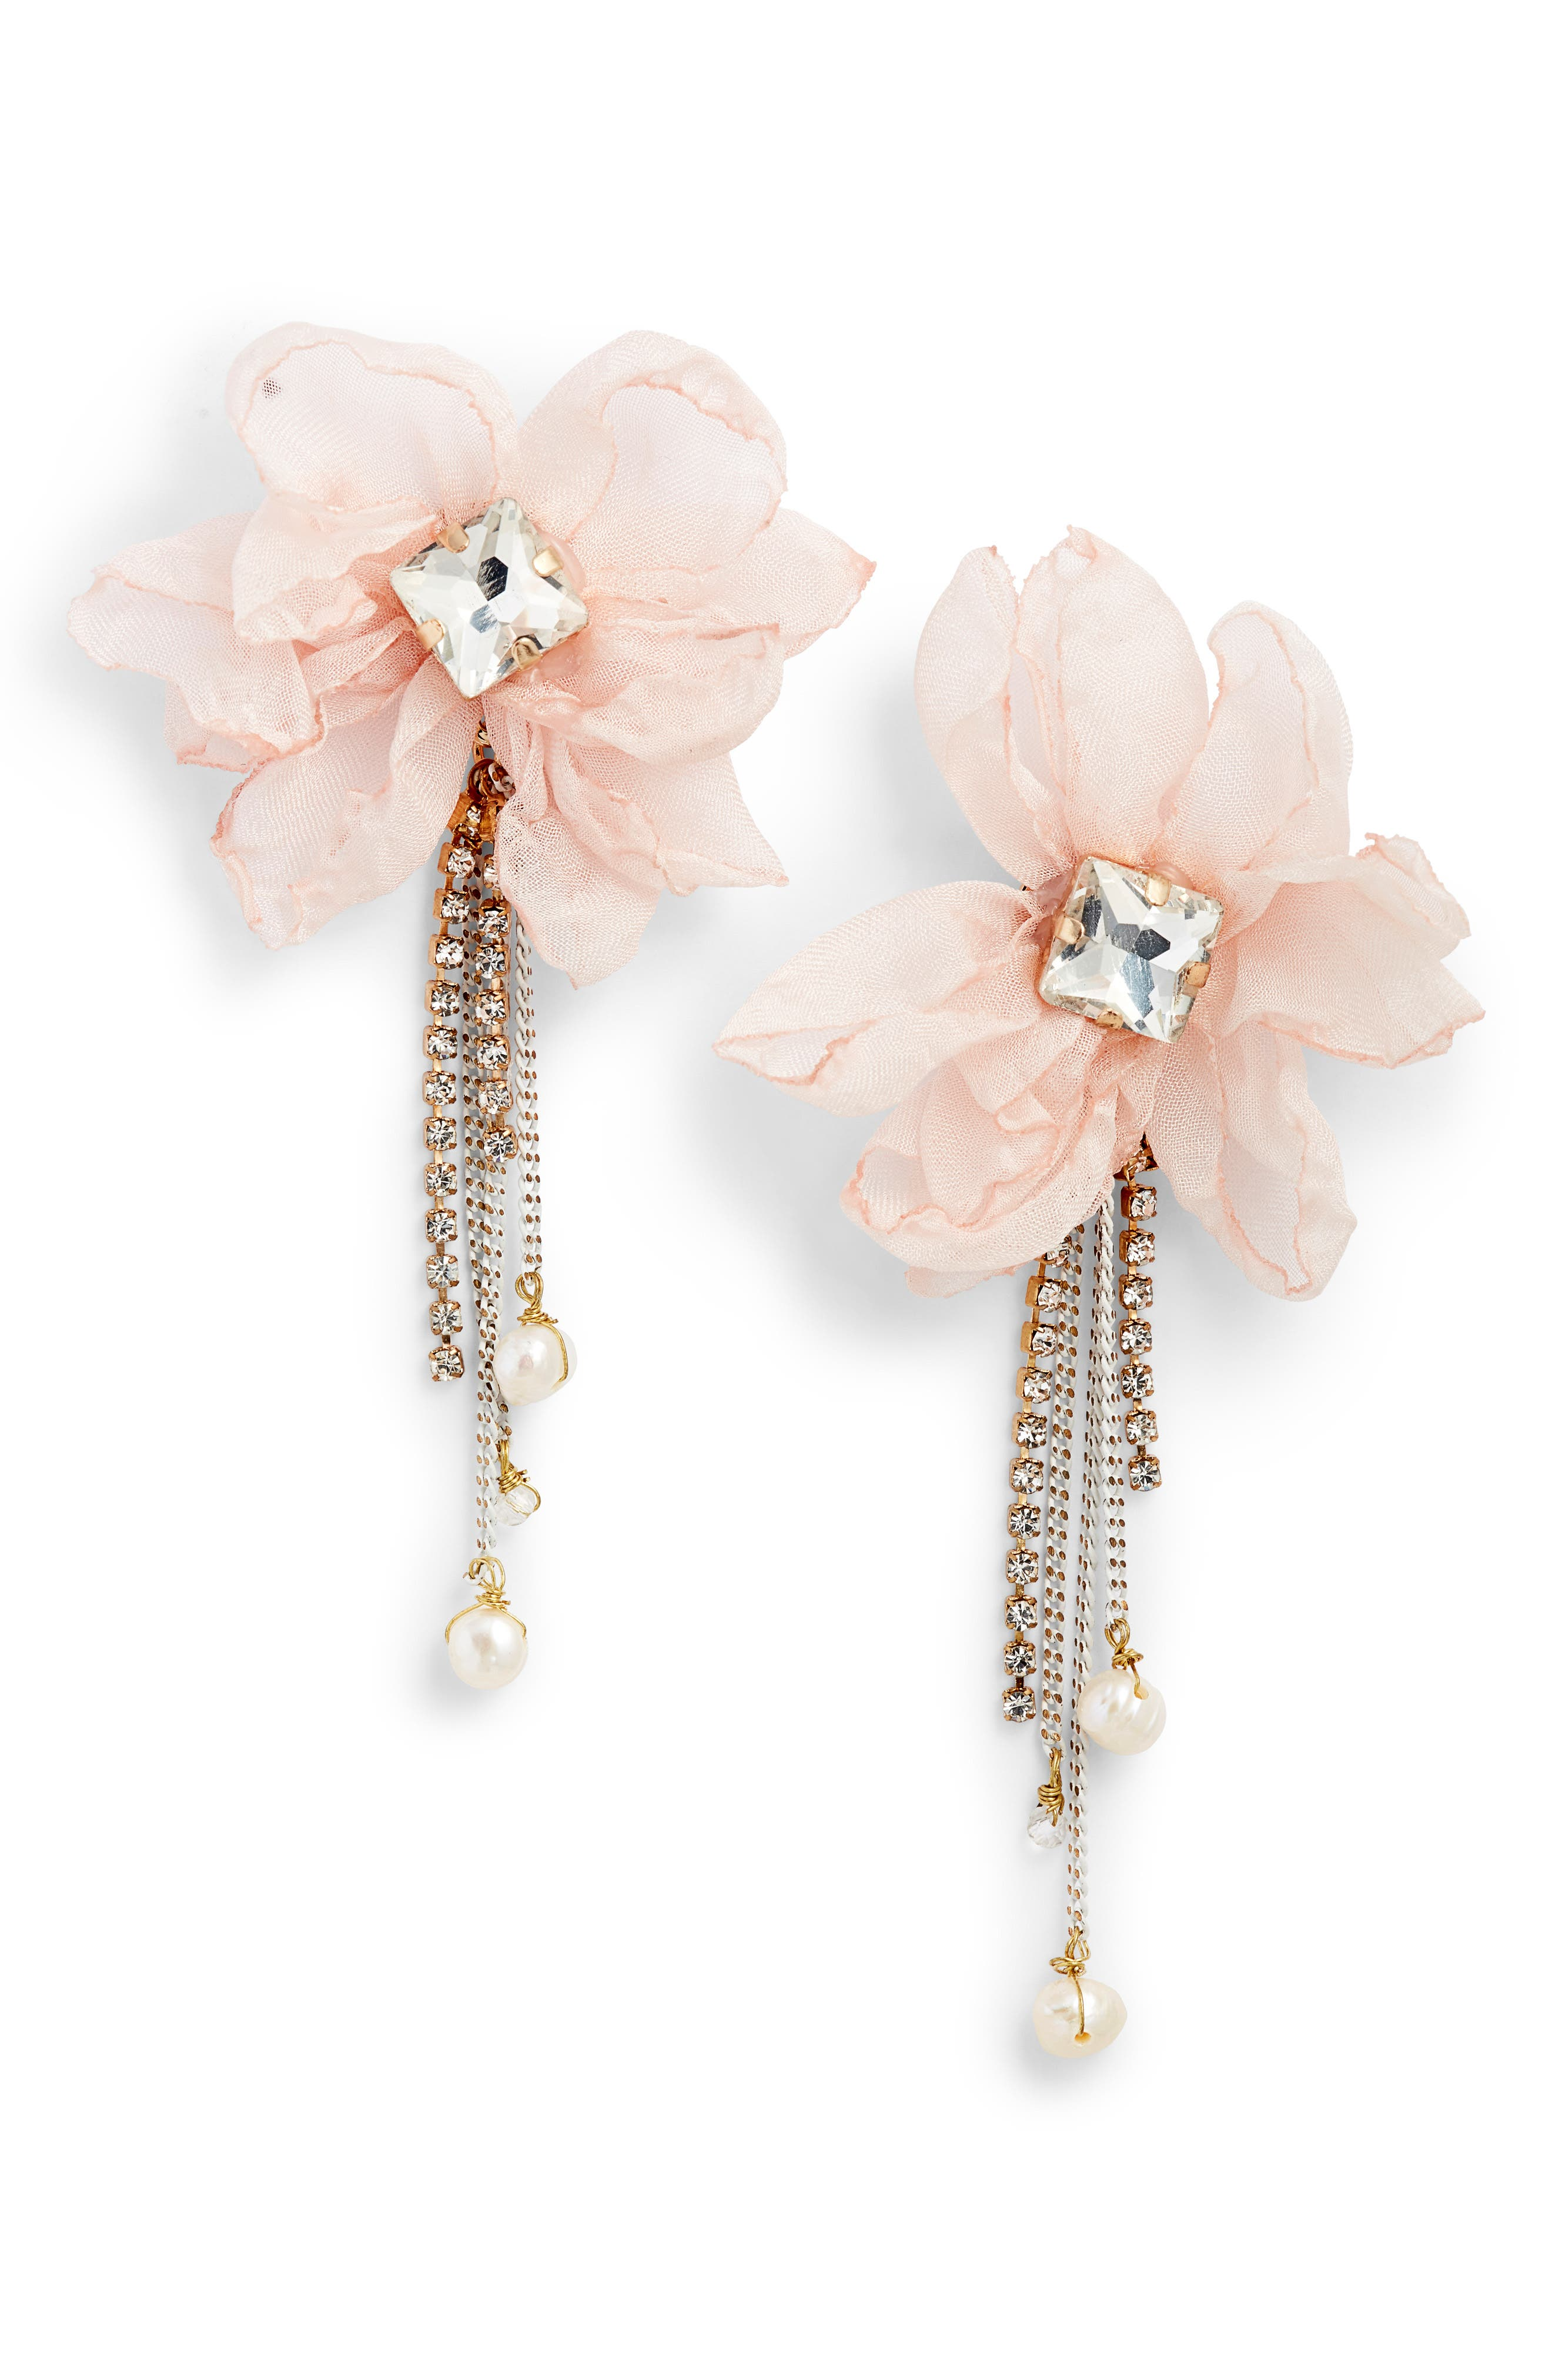 STELLA + RUBY Chiffon Statement Earrings in Gold/ Pink